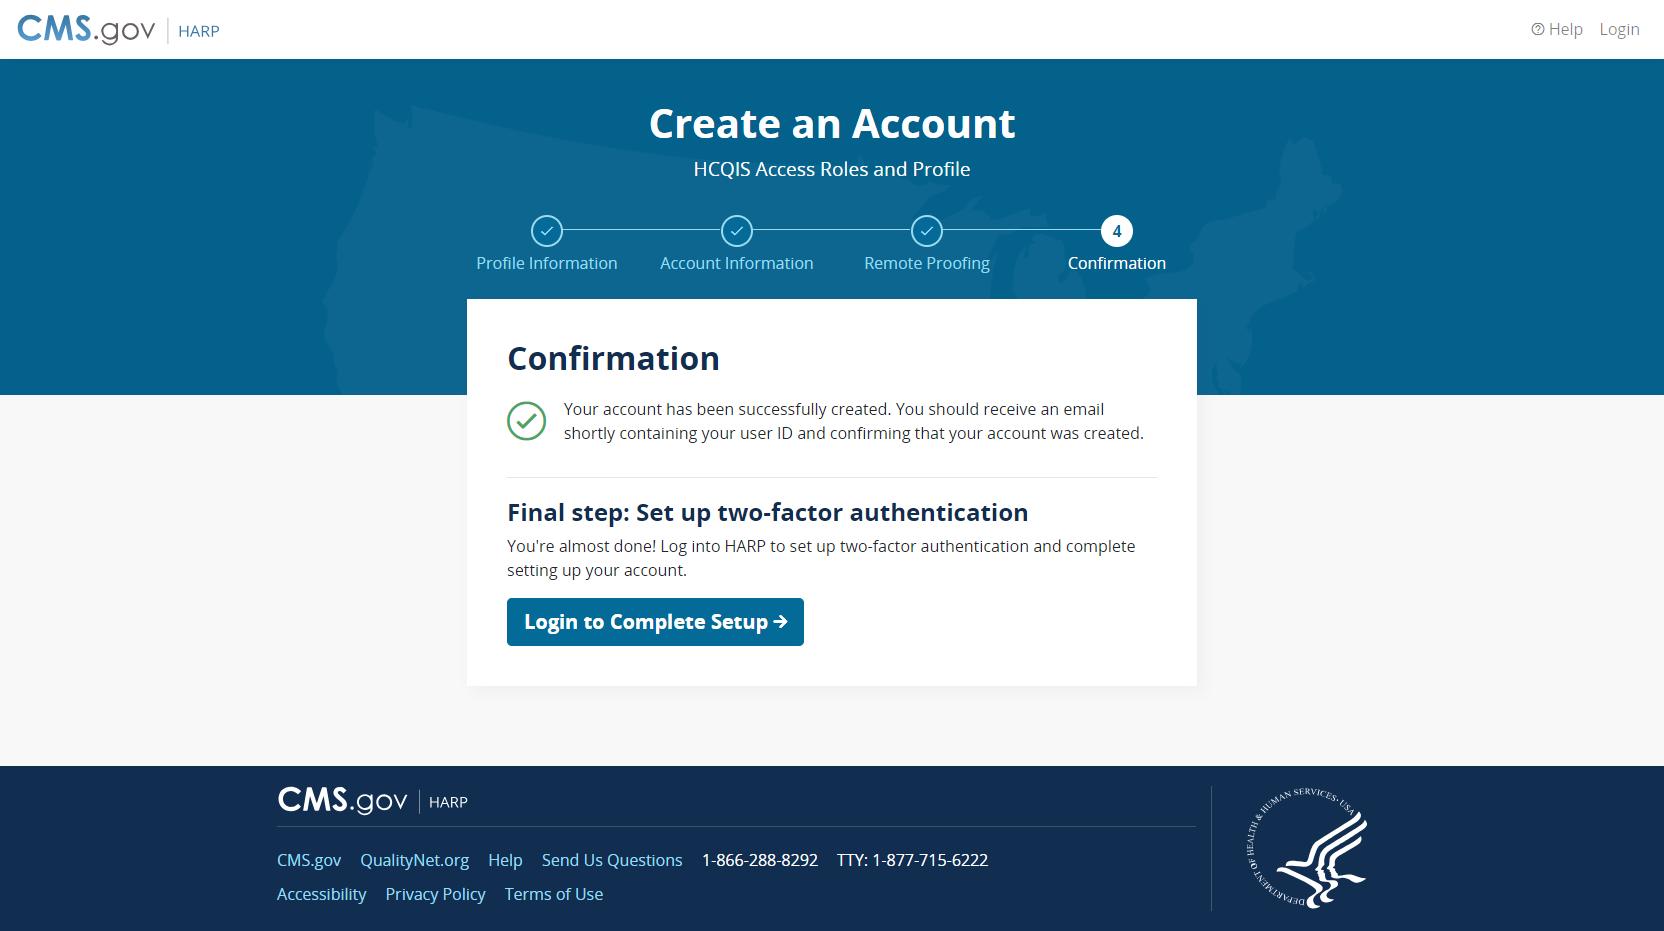 HARP-registration_confirmation-remote-proofing